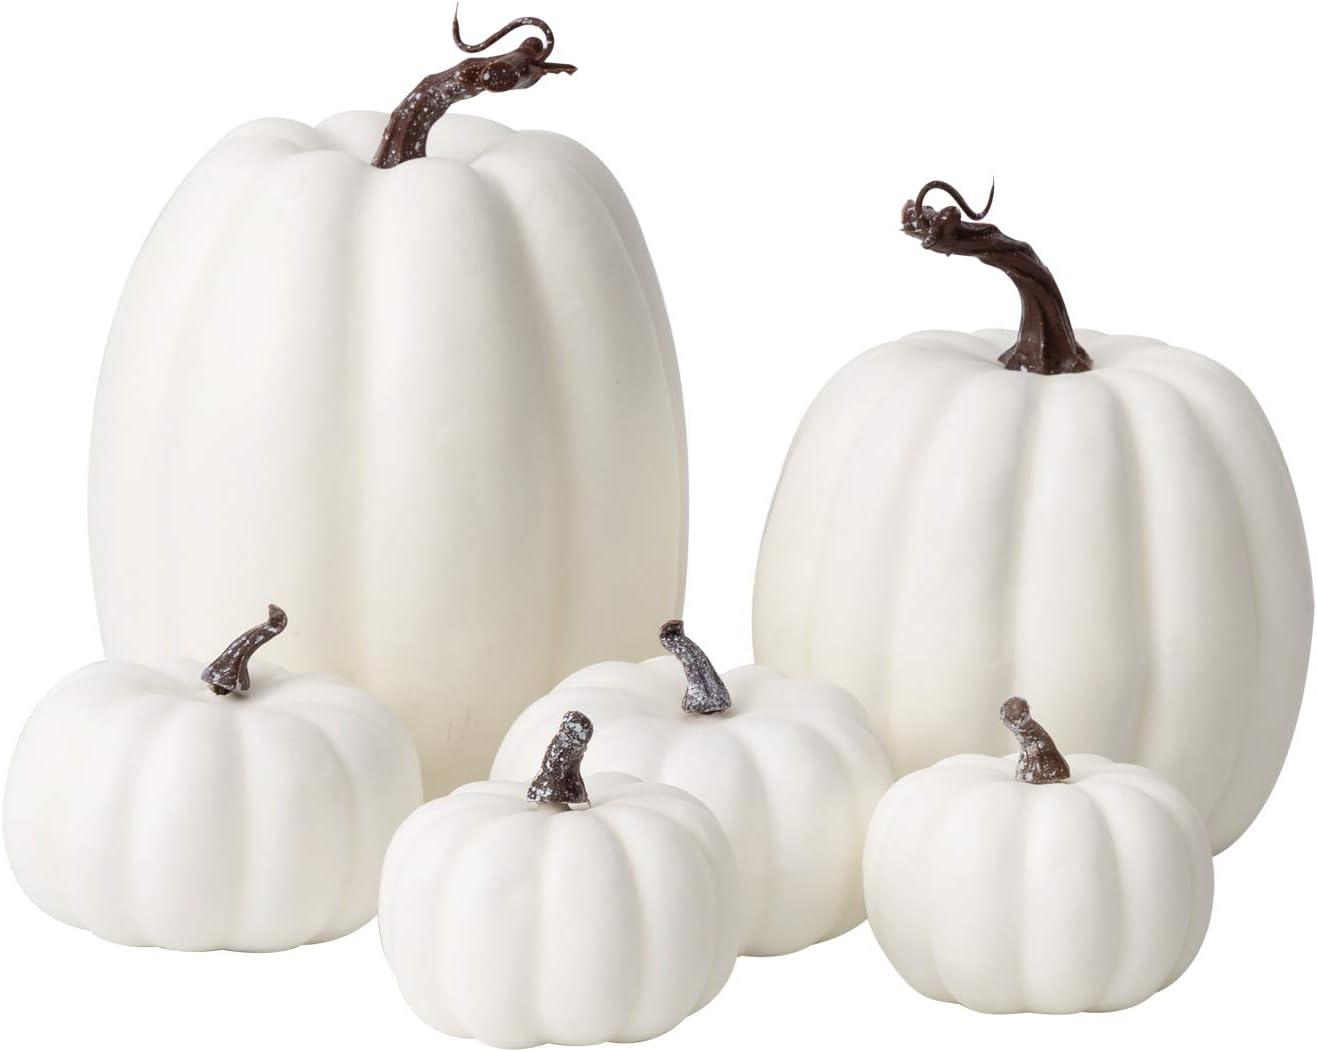 Oyydecor 6Pcs Assorted Sizes Artificial Pumpkins Decoration Harvest Fall White Pumpkins Fake Foam Pumpkins for Fall Autumn Decor Thanksgiving Halloween Decorations (White, 6pcs)